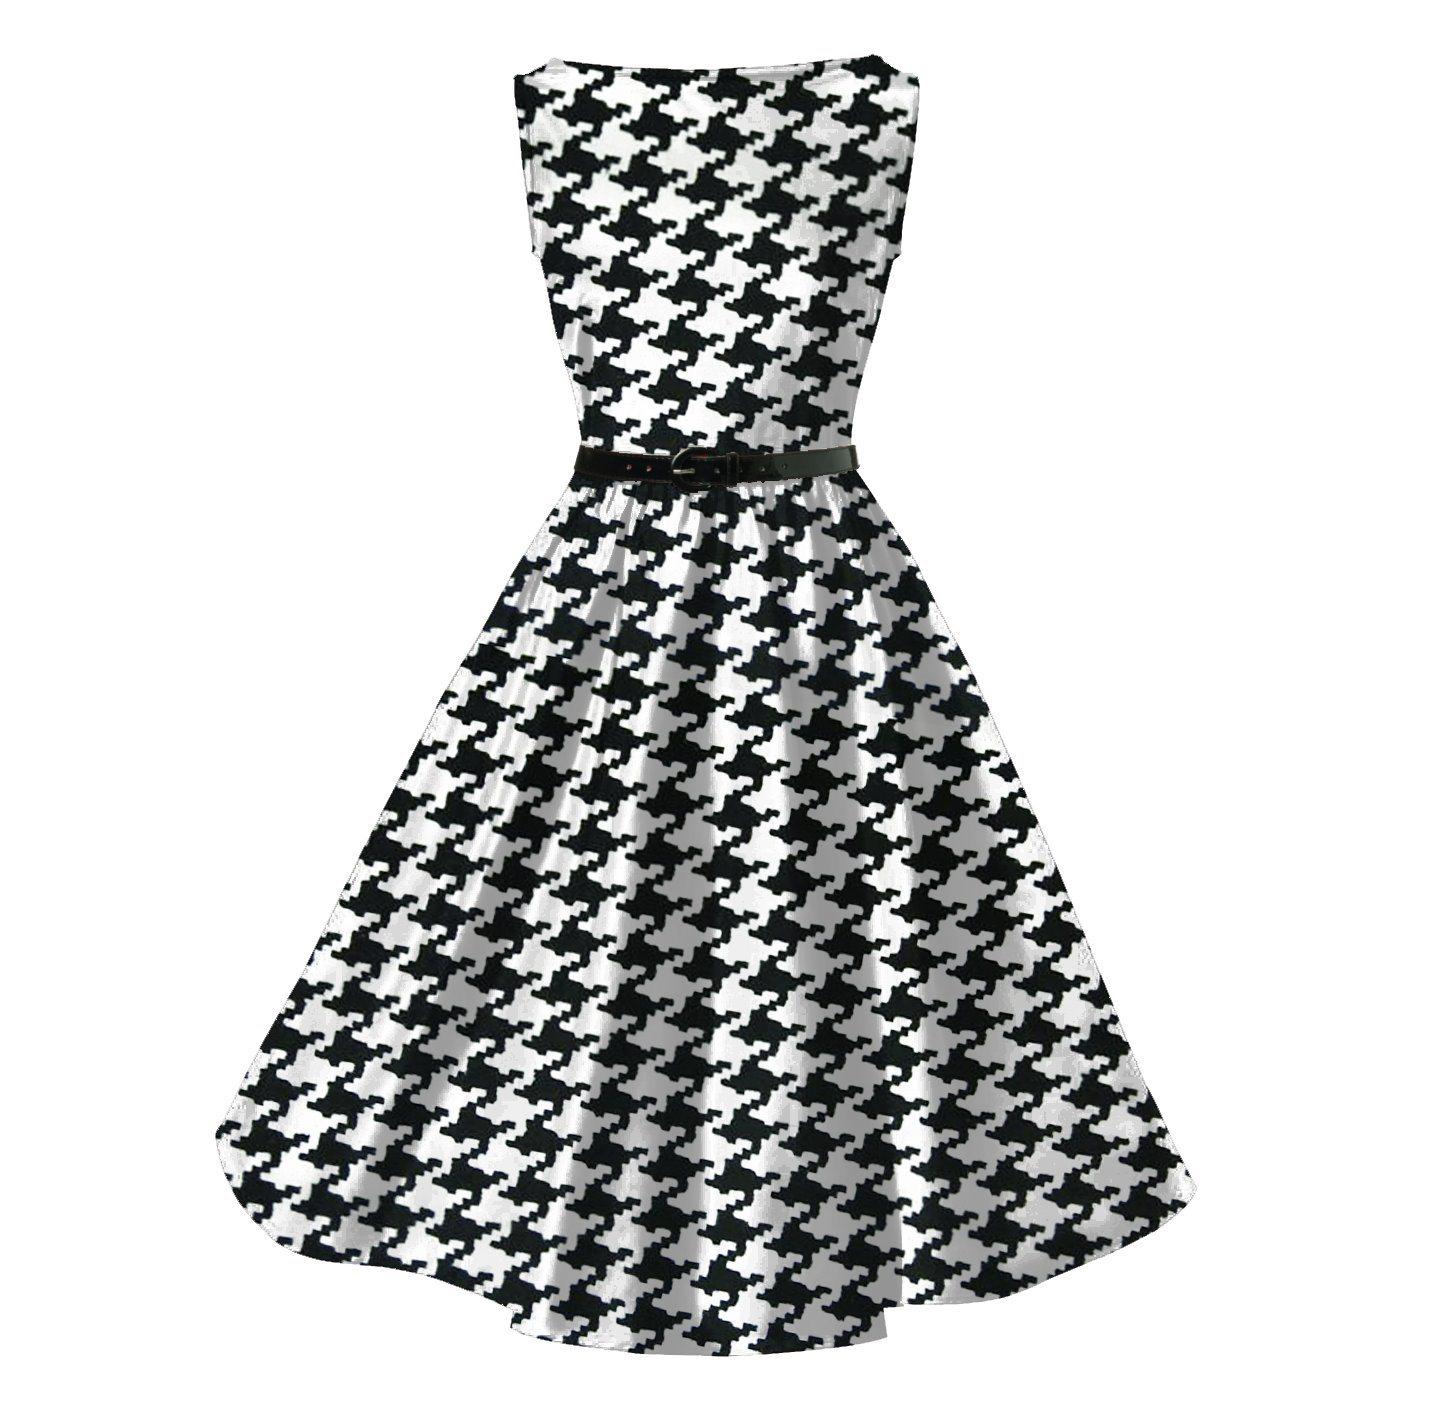 China Rockabilly Houndstooth Printing Audrey Hepburn Plus Size ...